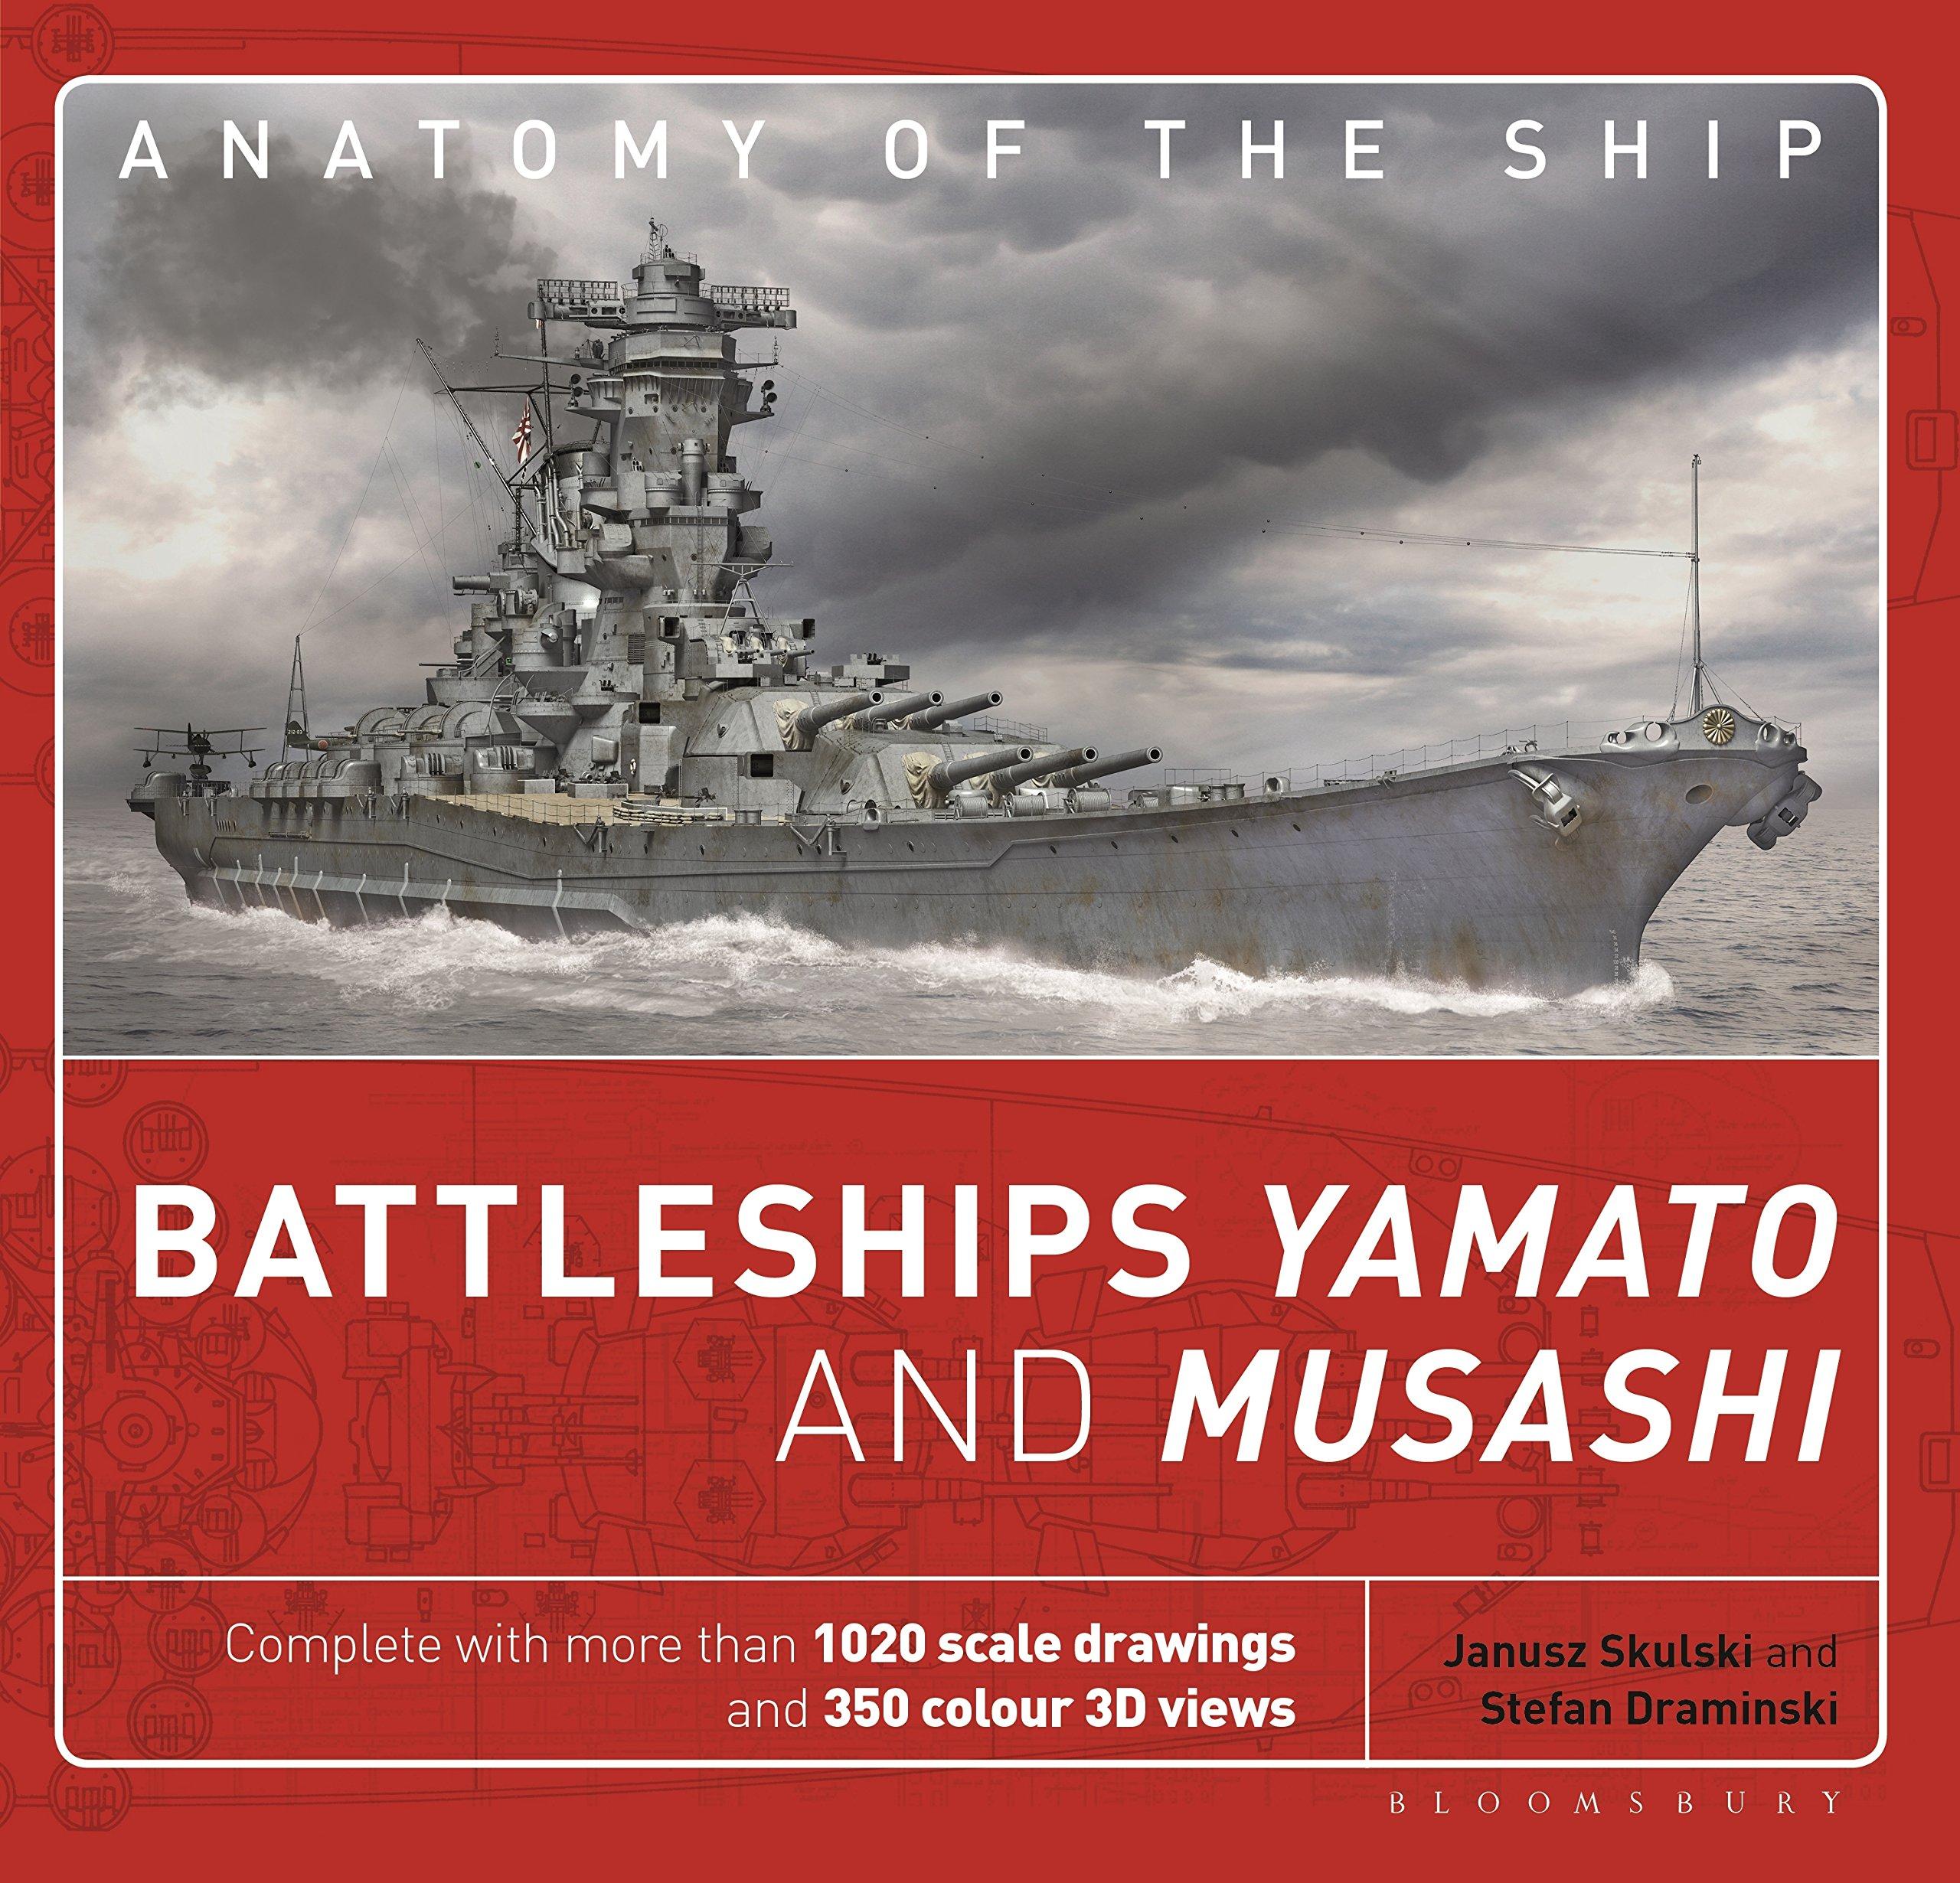 Battleships Yamato and Musashi (Anatomy of the Ship)